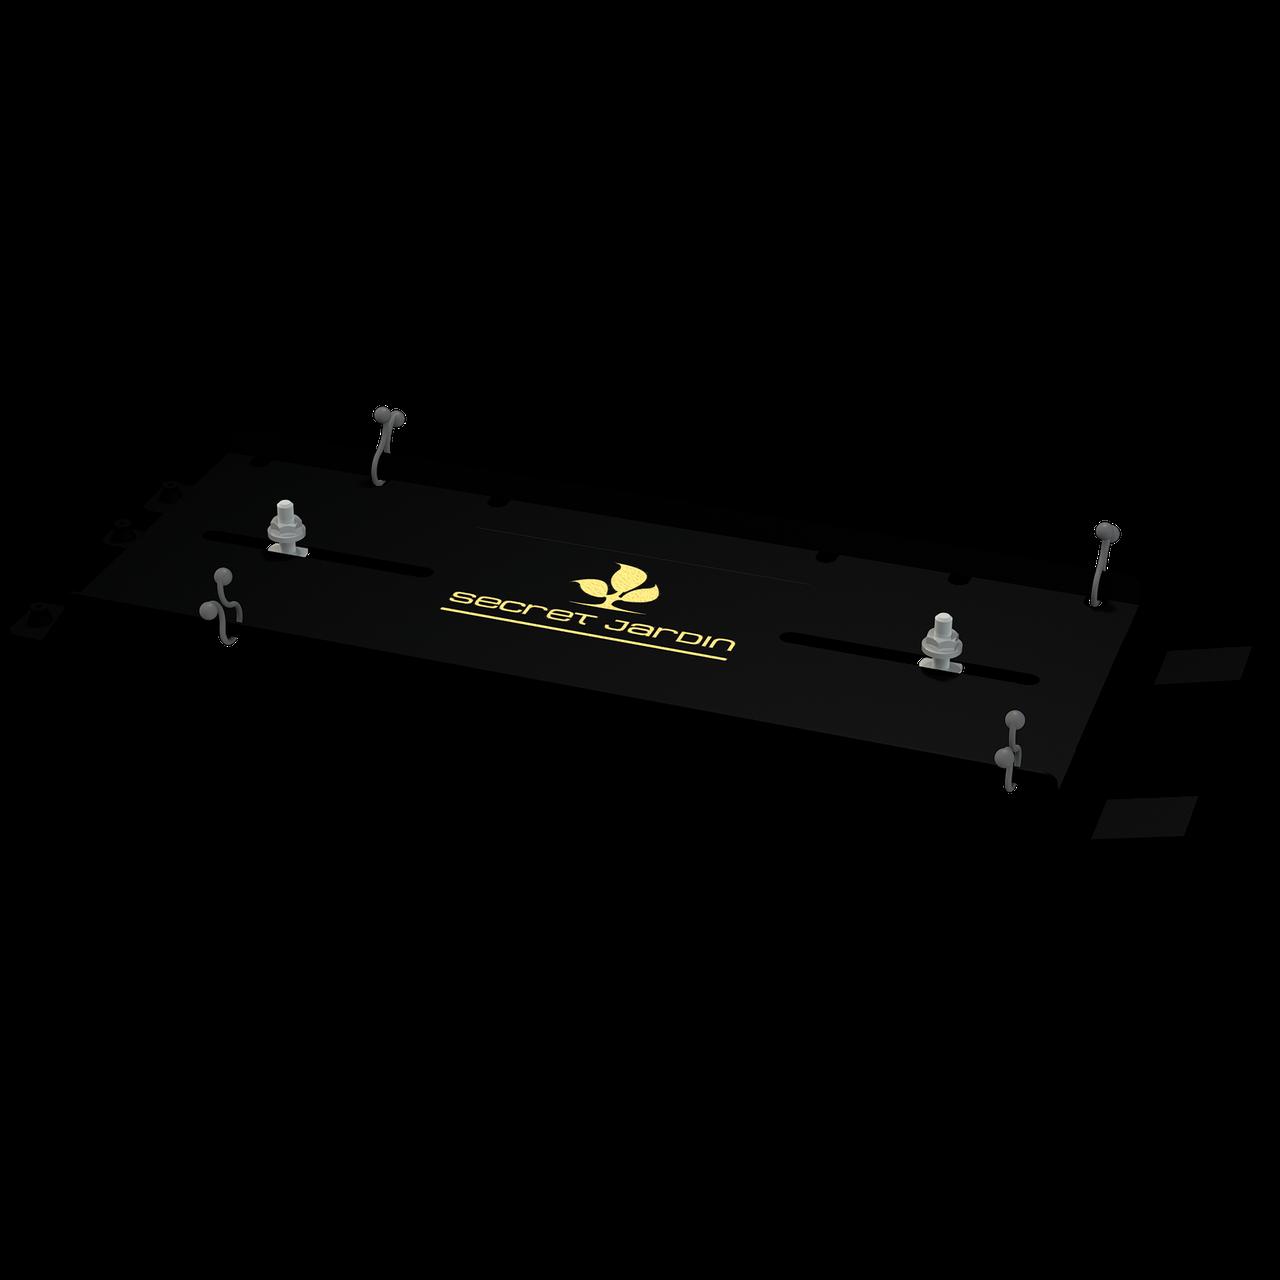 Крепление для балласта Ballast Support  CARRYIT 13cm x 36cm x 10kg